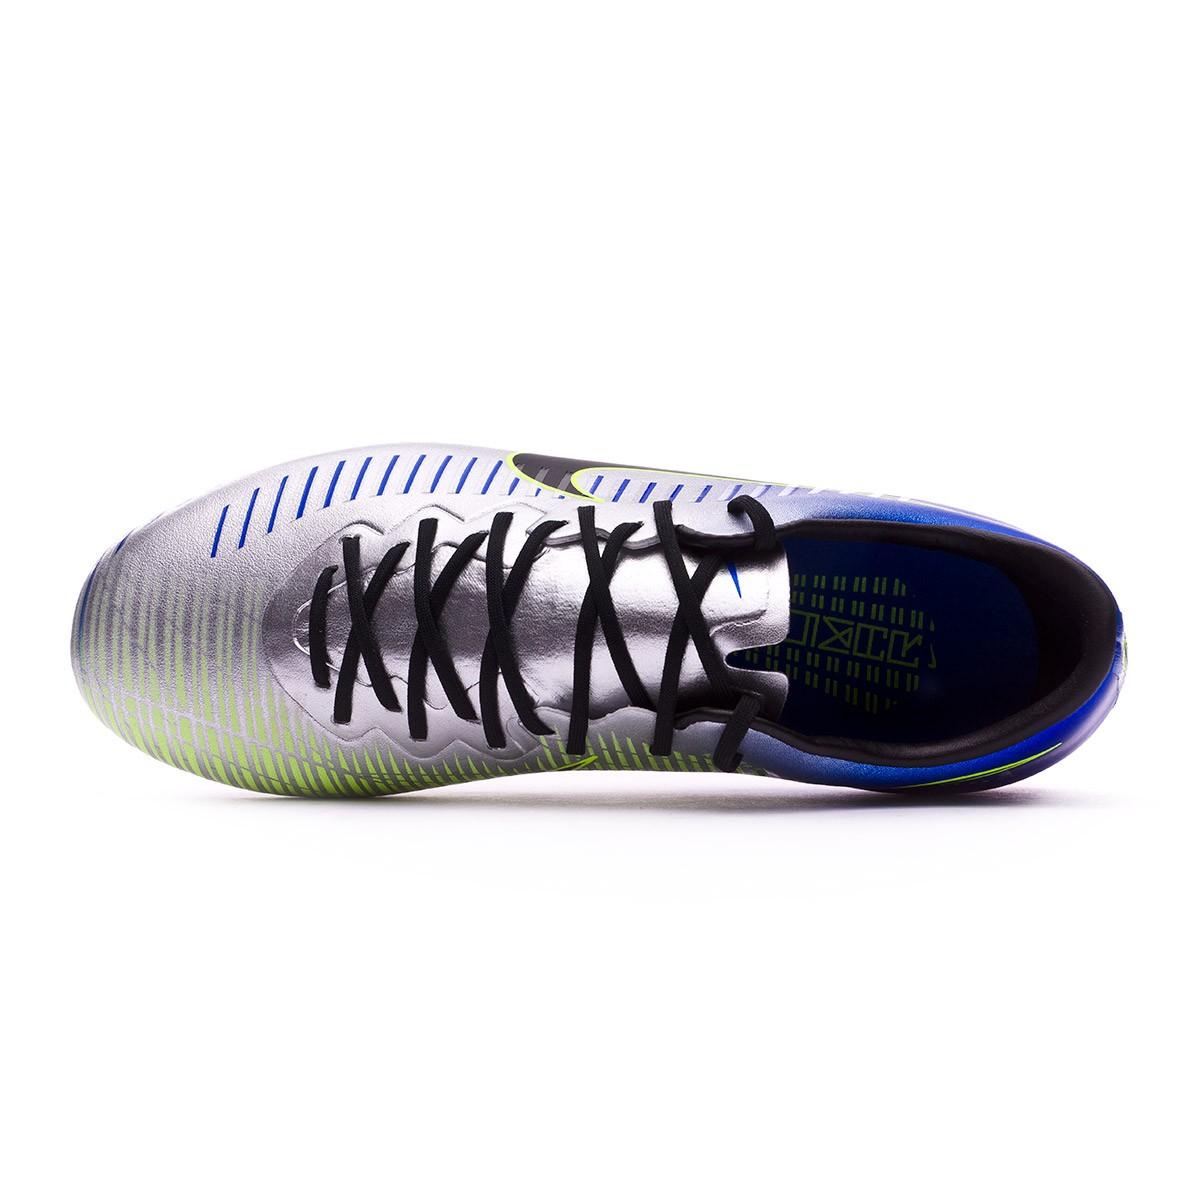 627ef7d520d Football Boots Nike Kids Mercurial Vapor XI FG Neymar Racer blue-Black- Chrome-Volt - Tienda de fútbol Fútbol Emotion